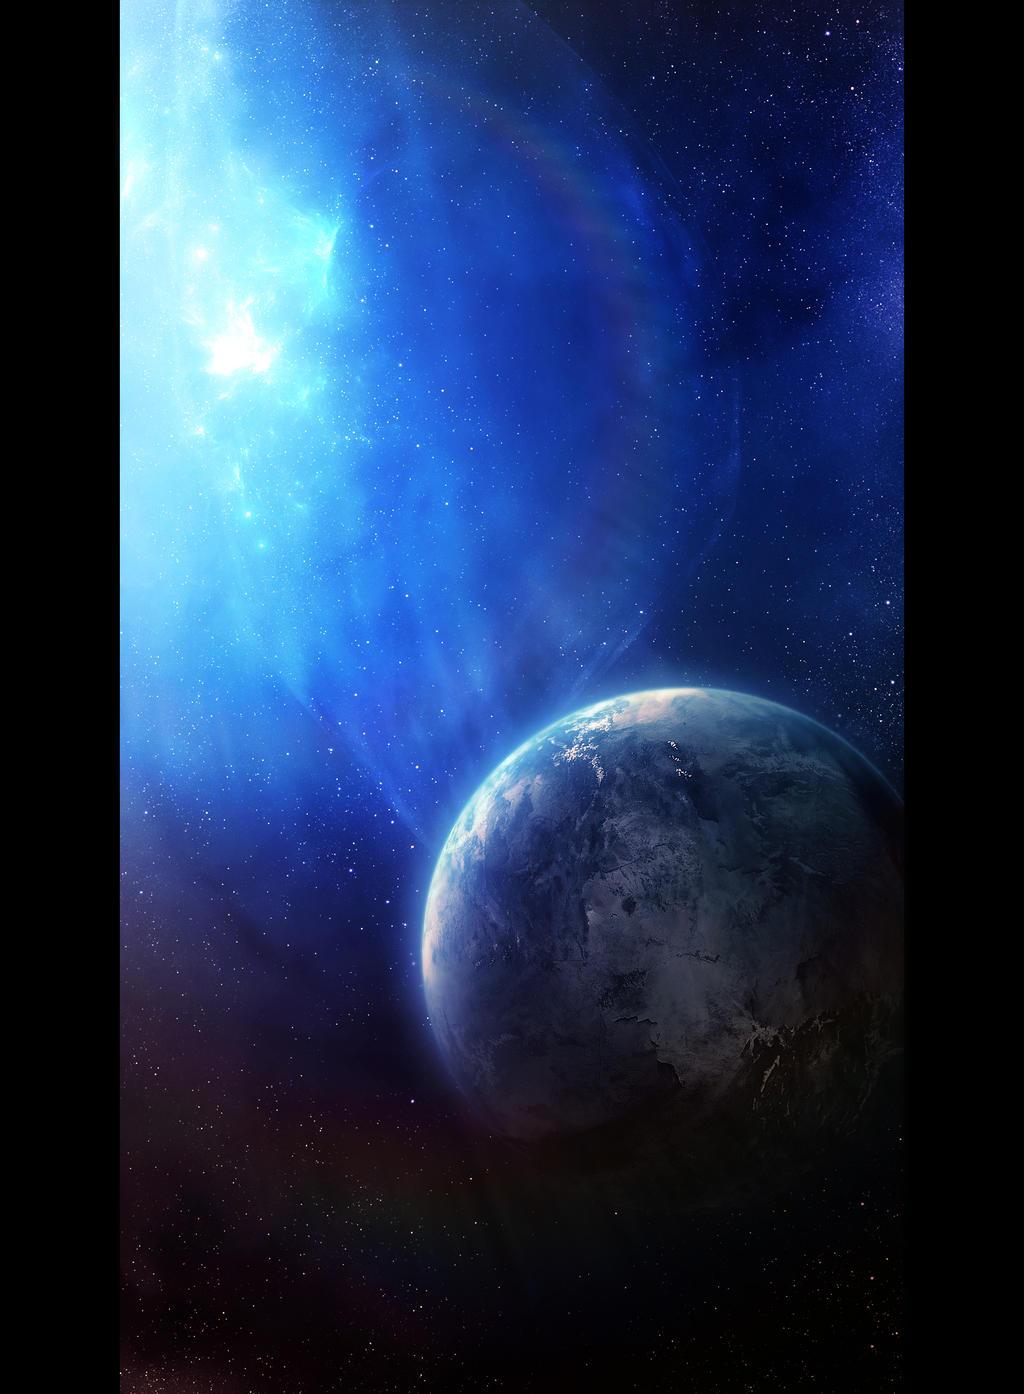 Dreamweaver by ex-astris1701